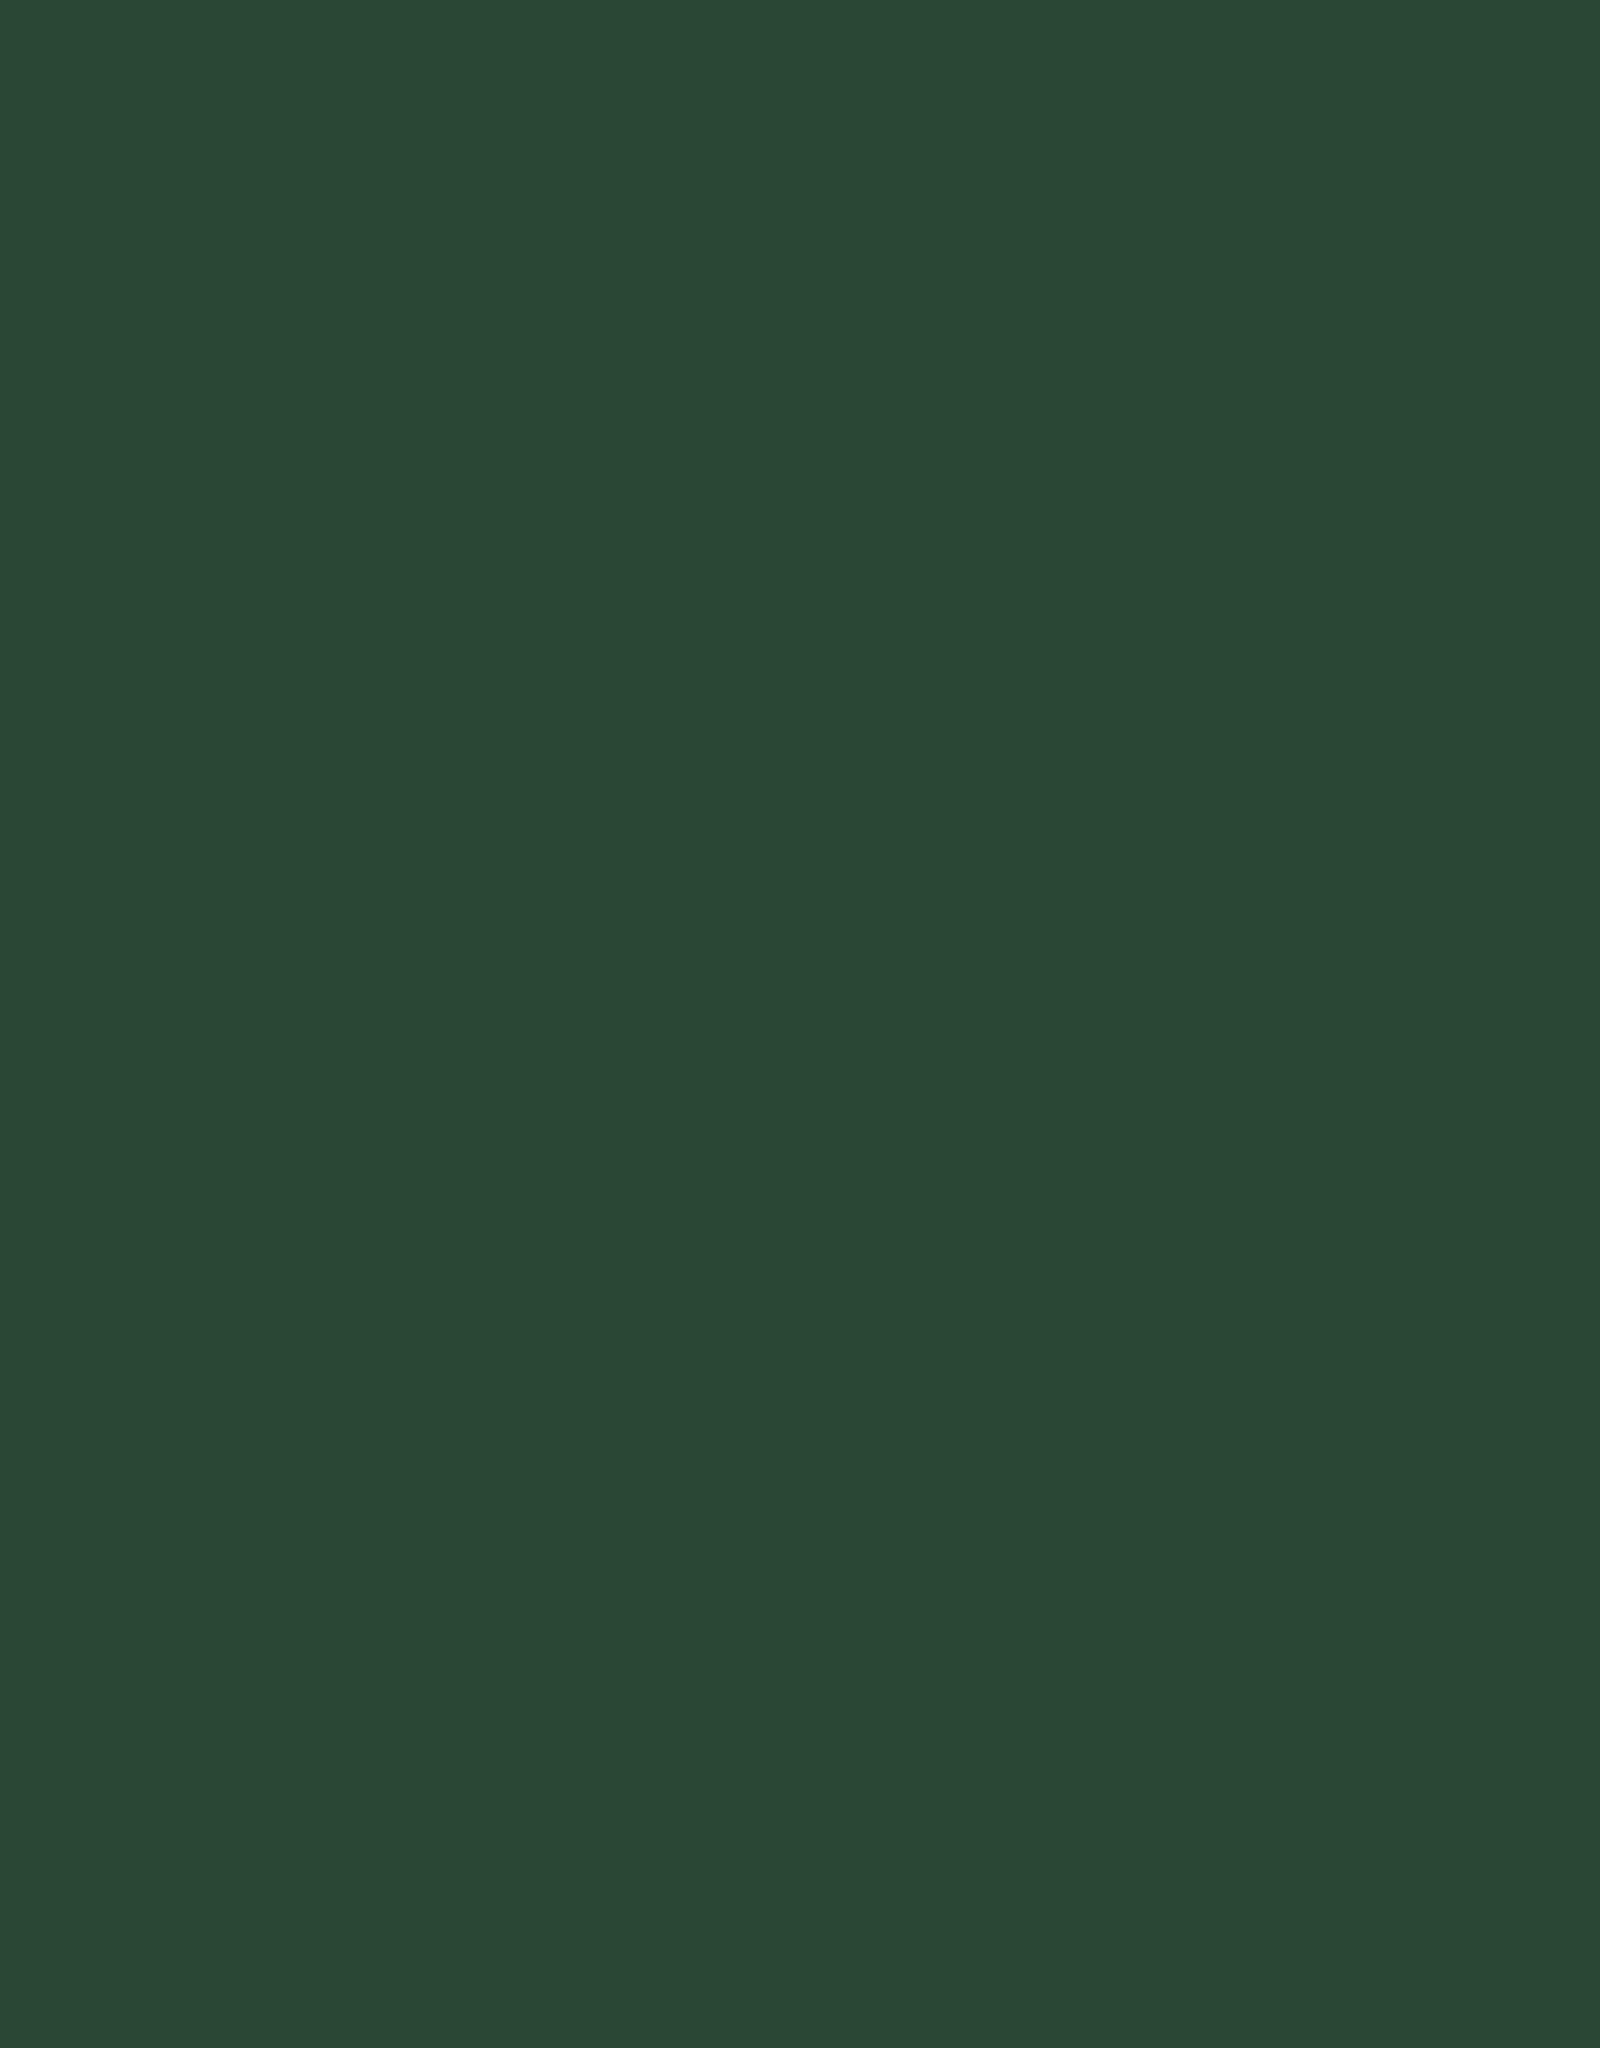 Jacquard Solarfast Green Large